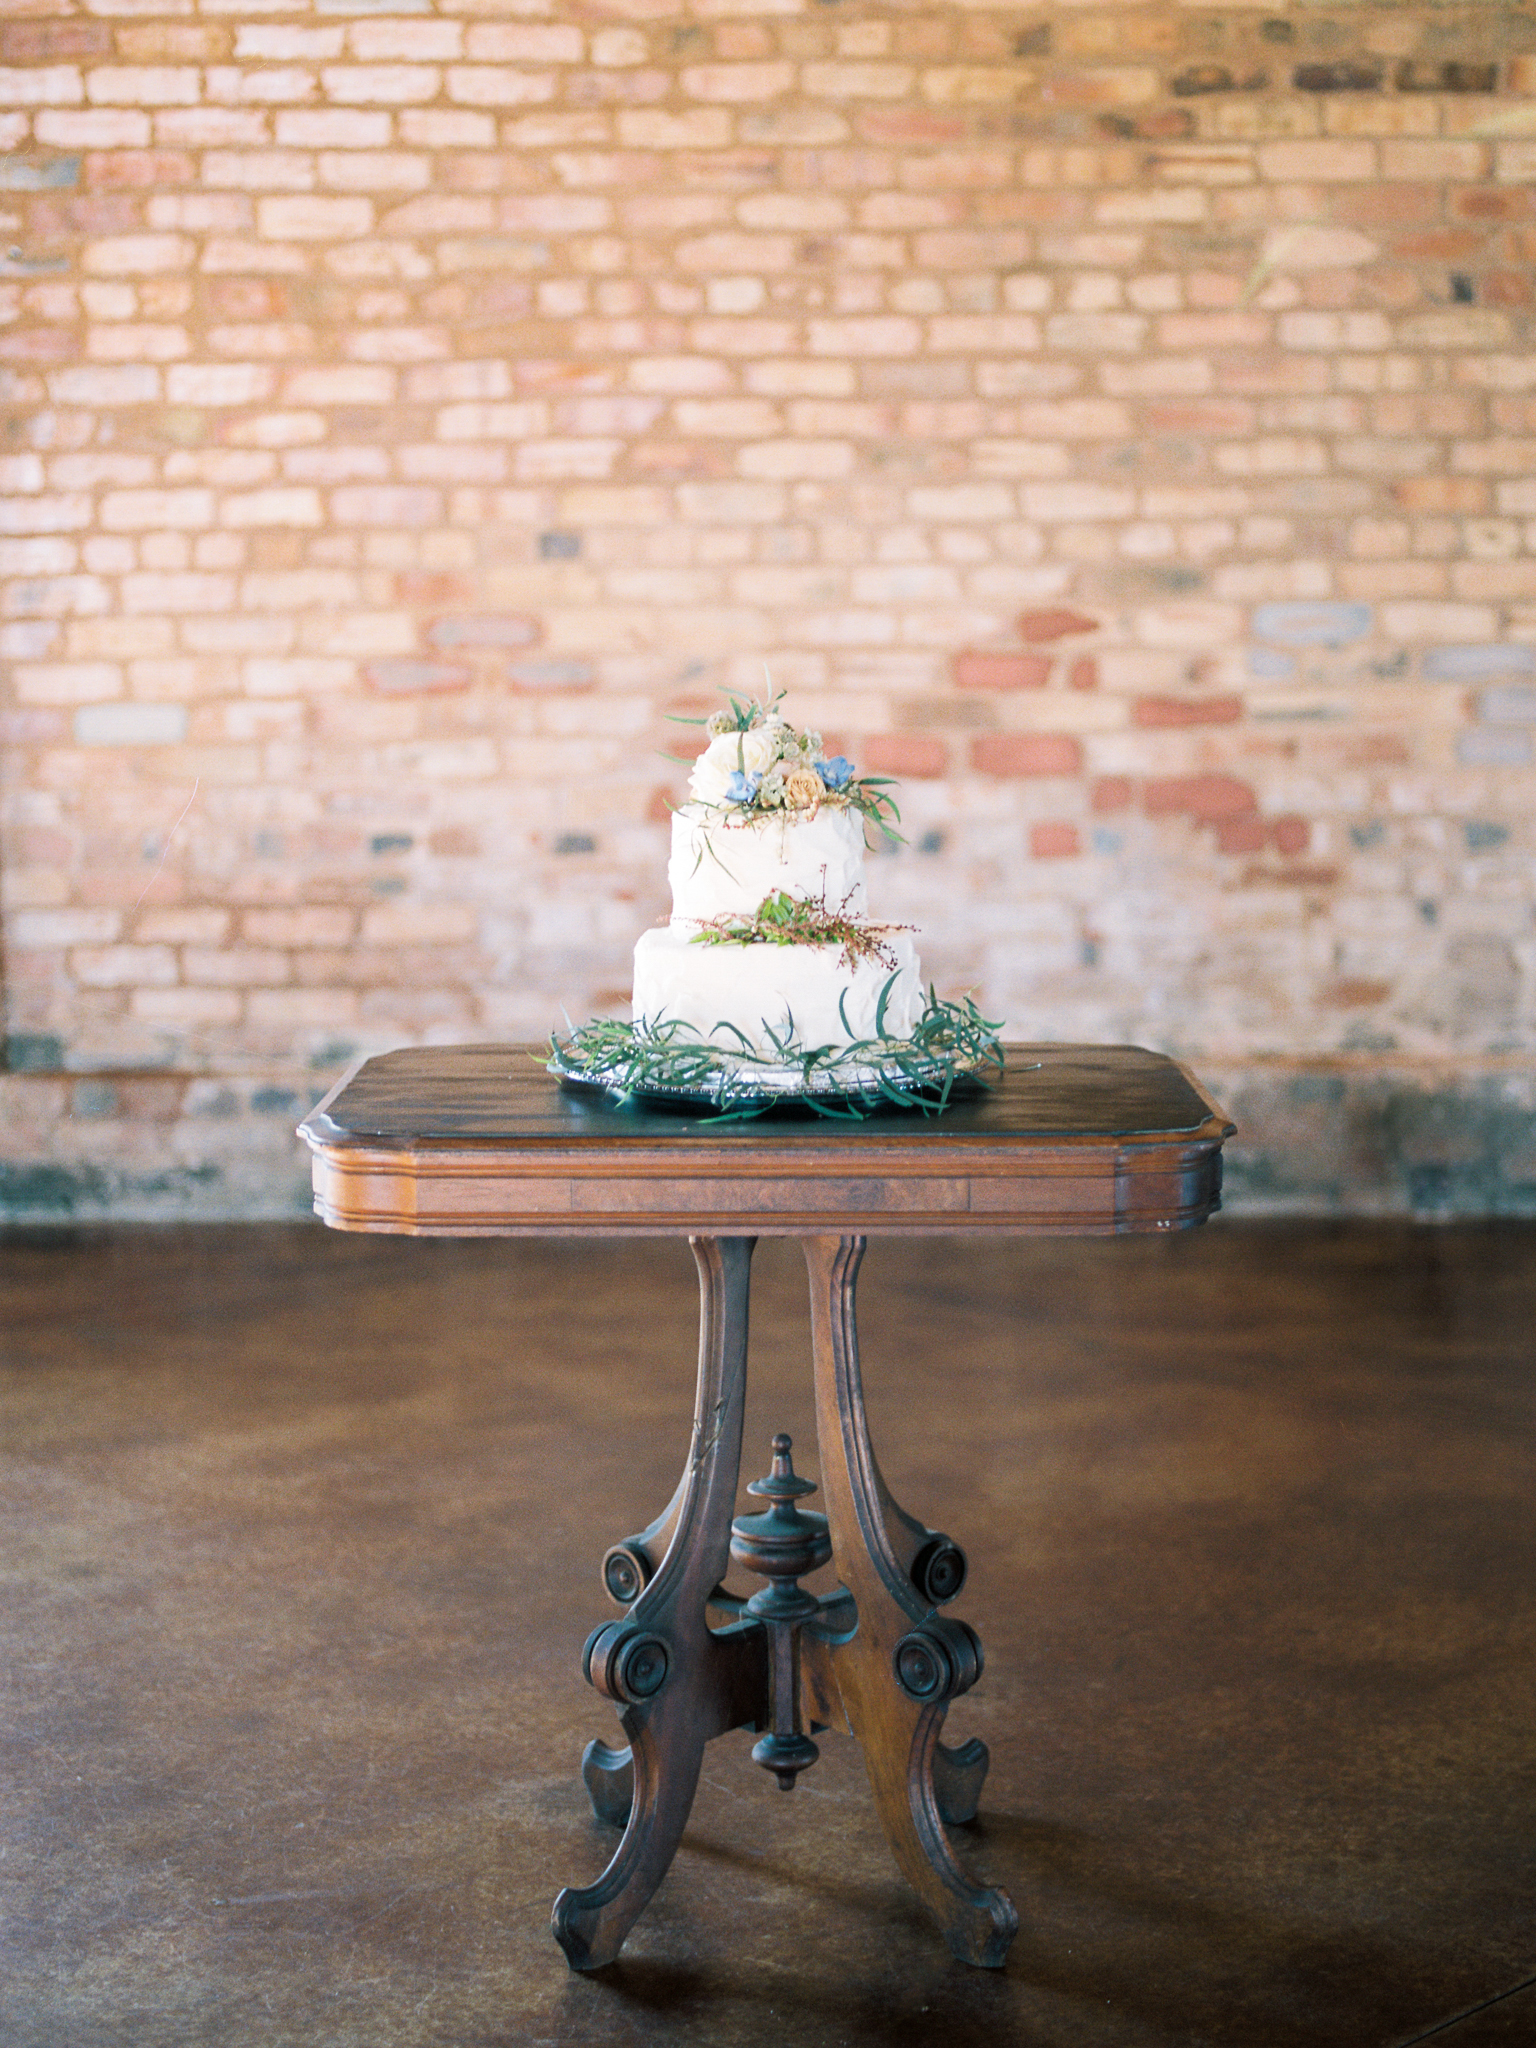 christinadavis+weddinginspiration07.jpg